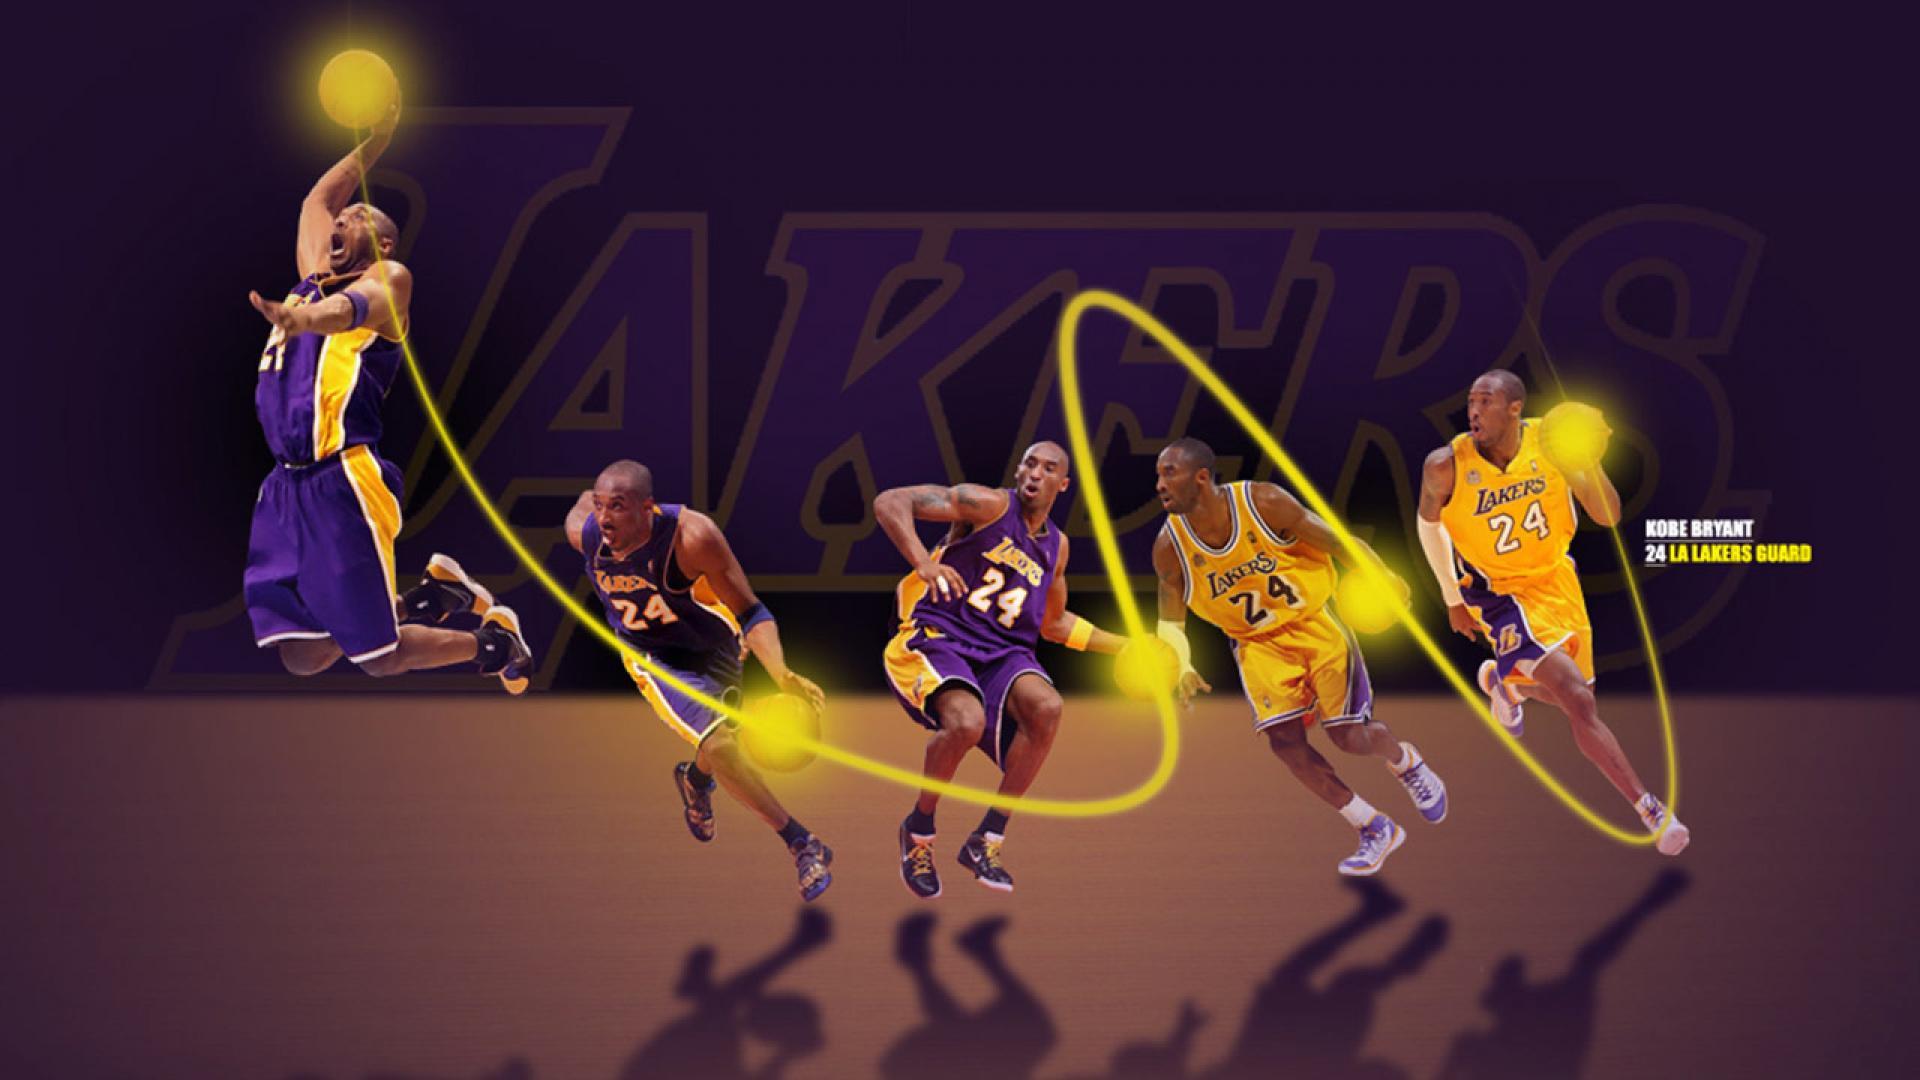 Slamdunk Angeles Los Lakers Slam Dunk Stream U S A HD Wallpaper